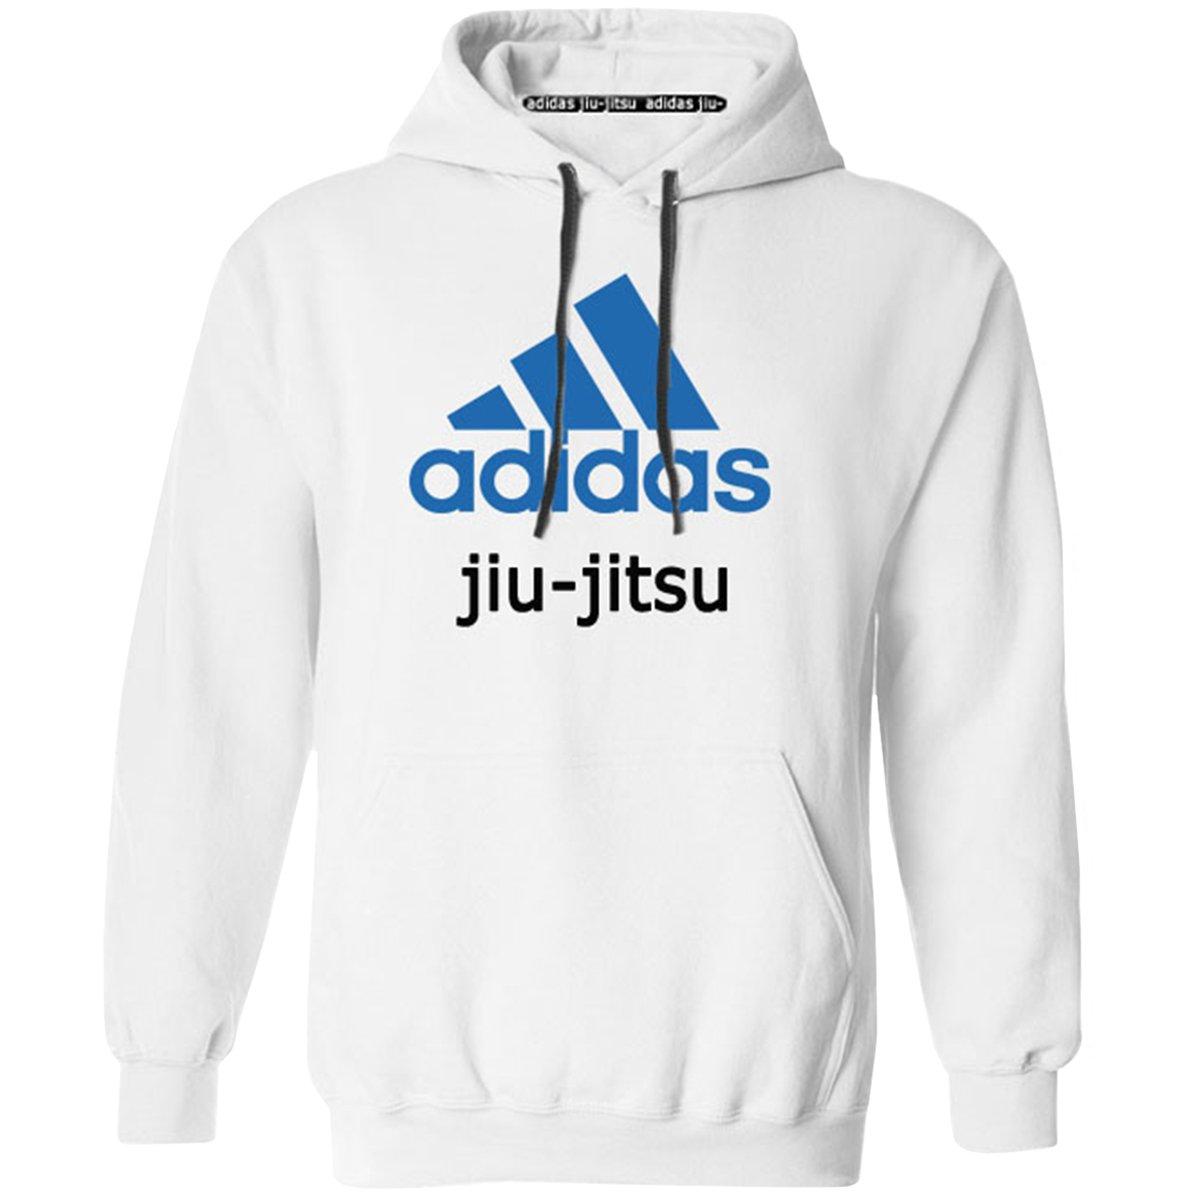 adidas Jiu Jitsu Hoodie